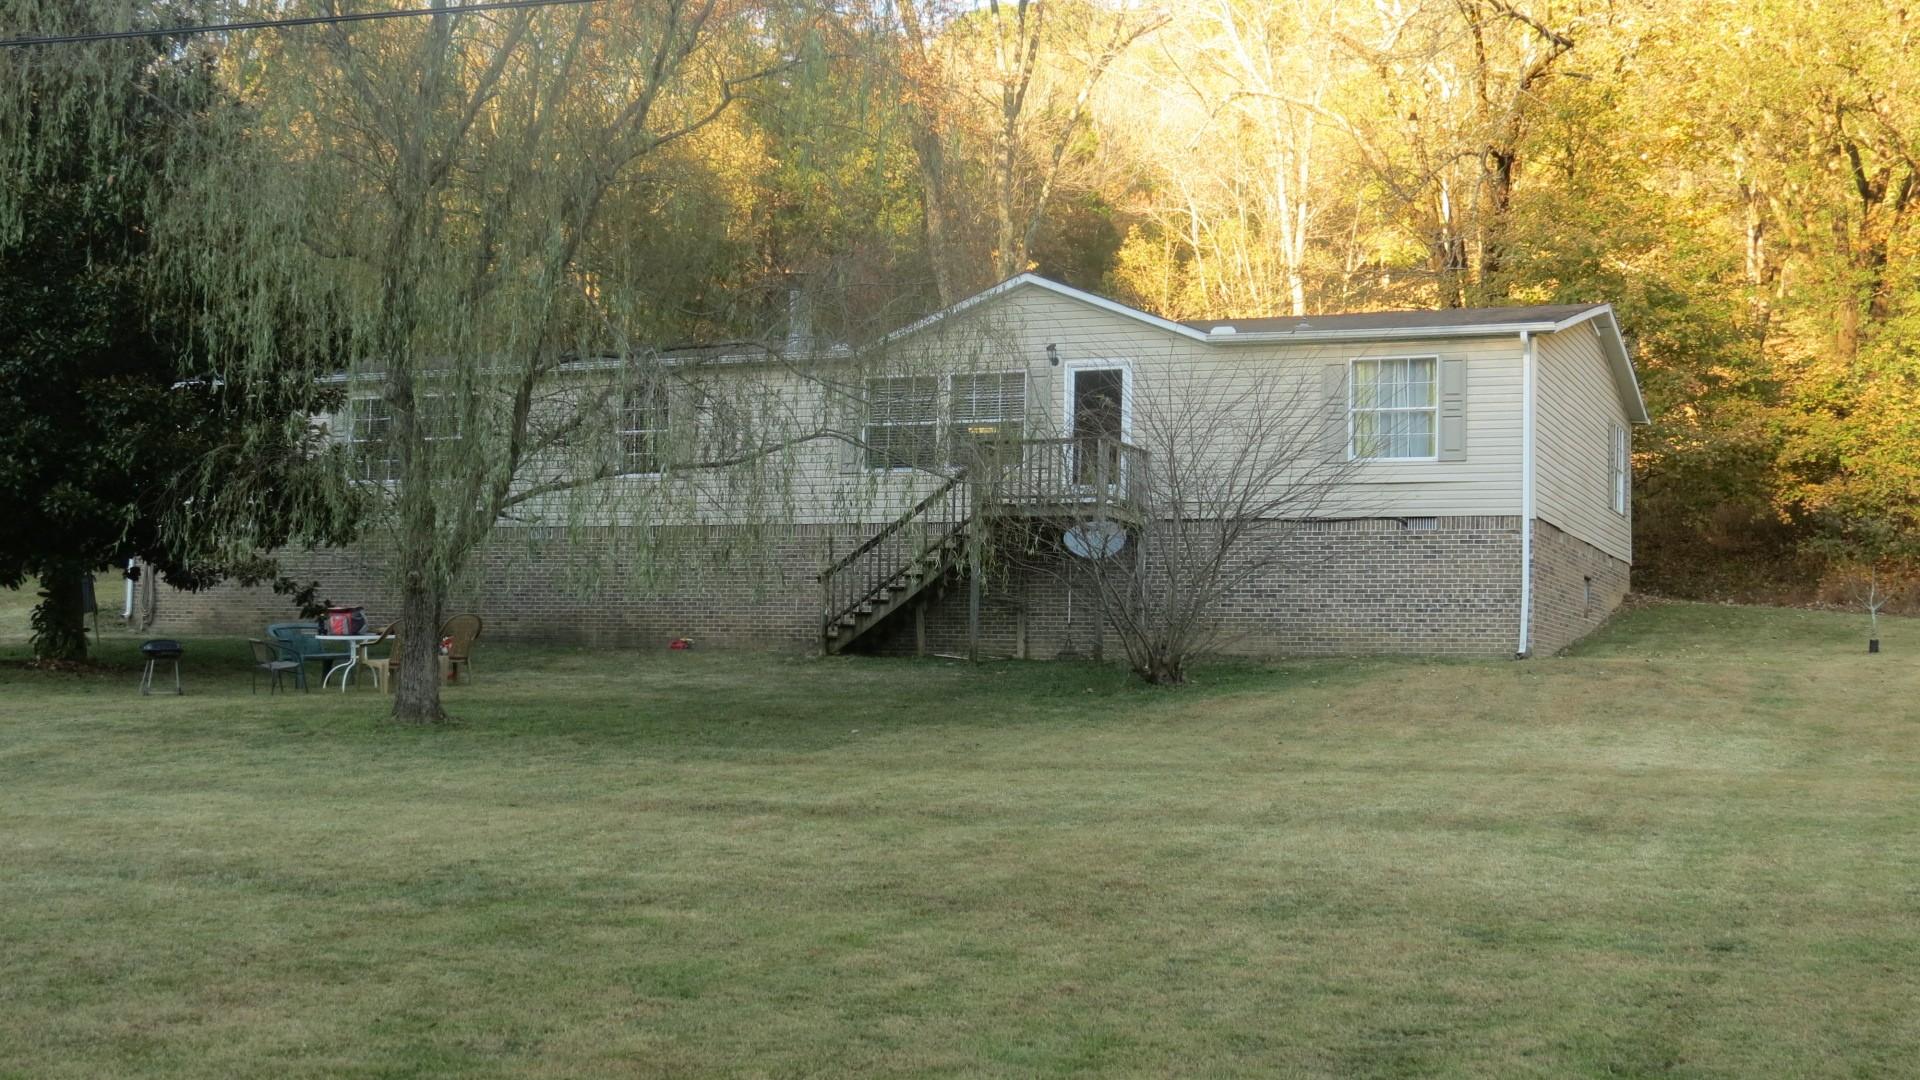 1478 Bartlett Hollow Rd, Petersburg, TN 37144 - Petersburg, TN real estate listing